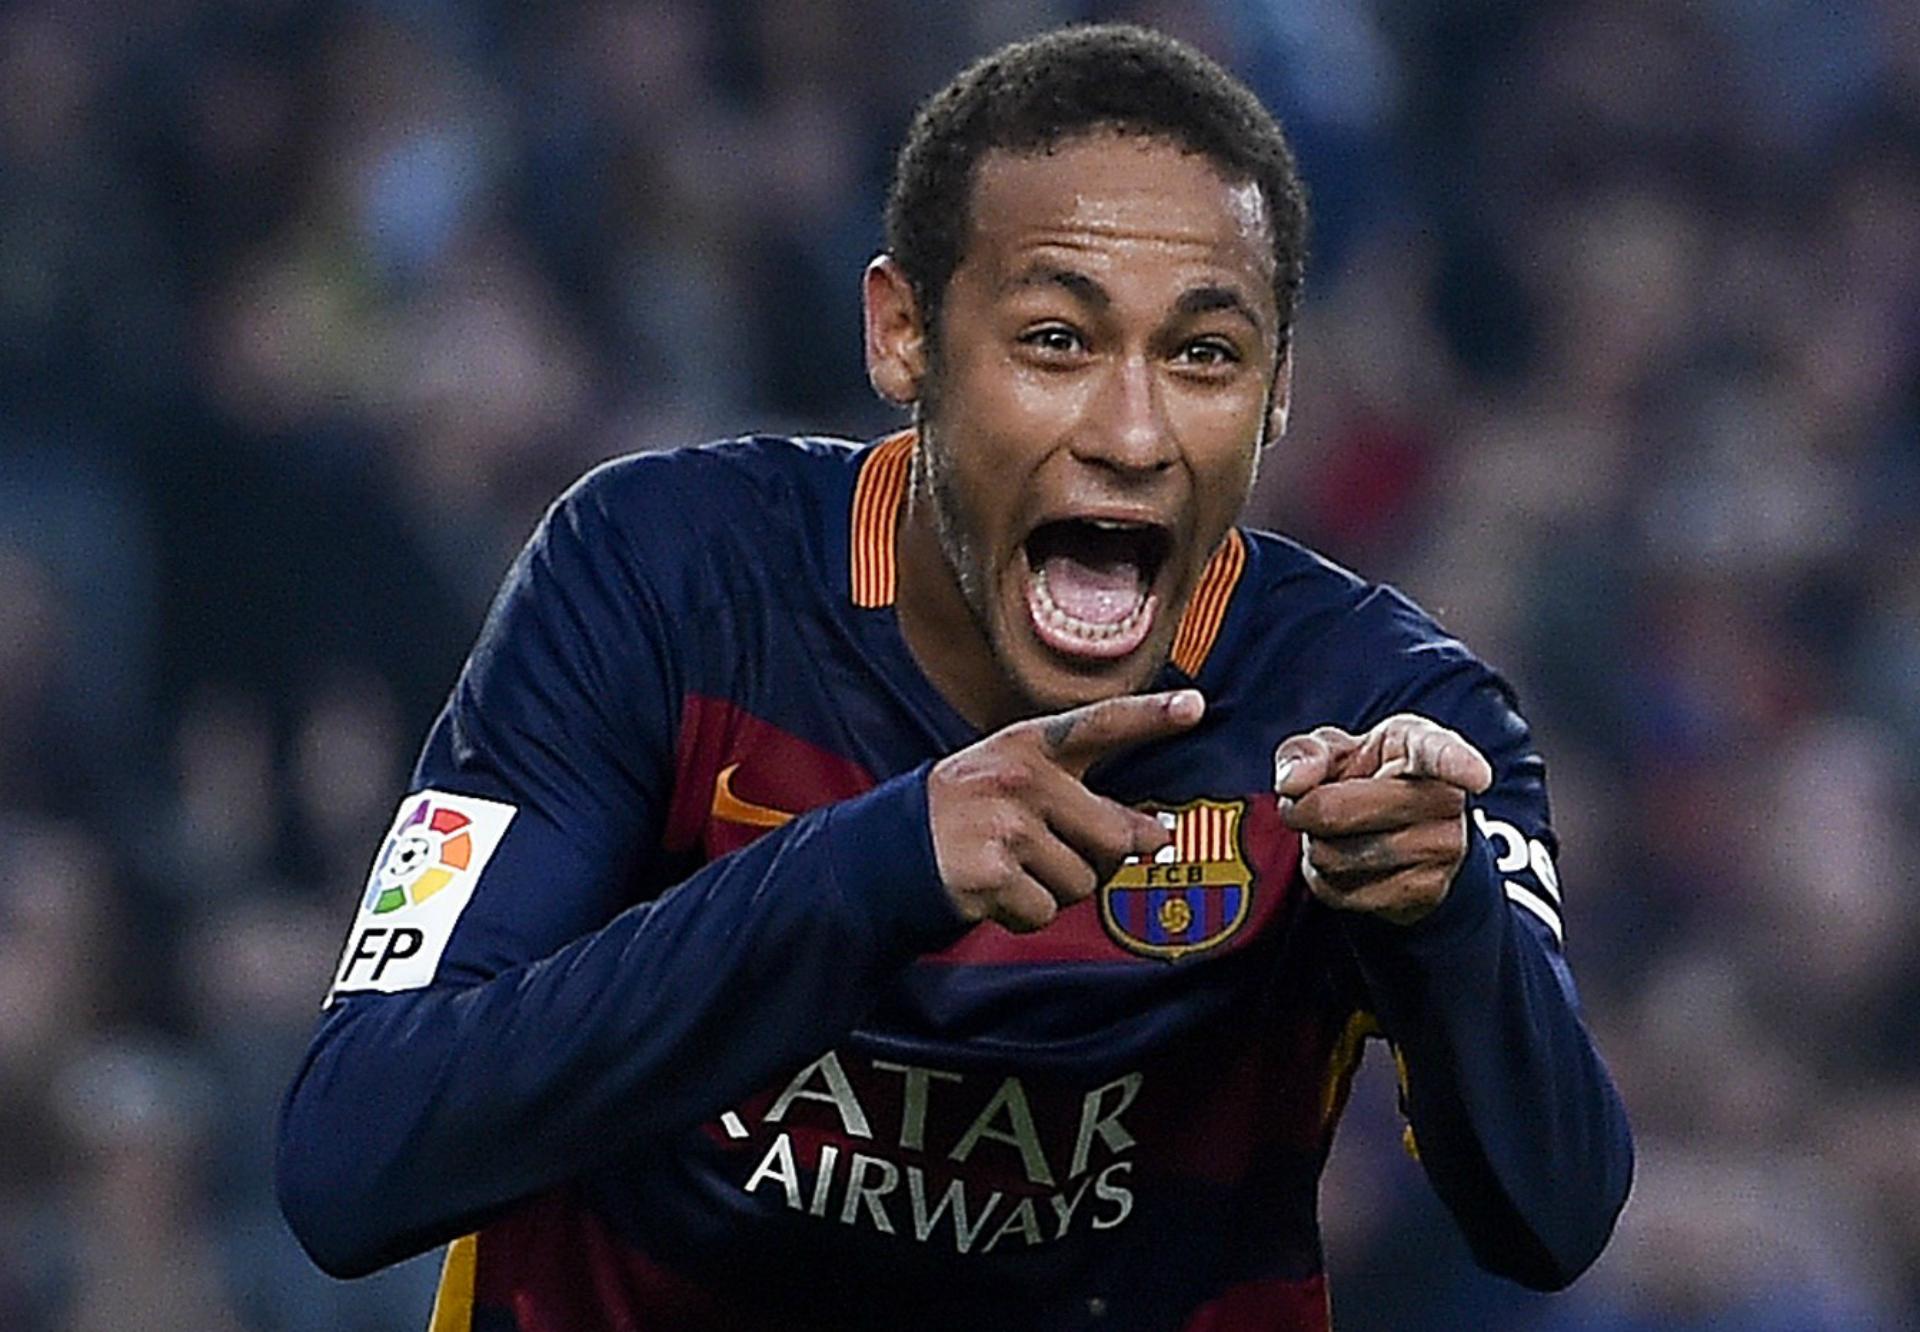 RUMOURS: Manchester United target Ronaldo, Neymar & Bale